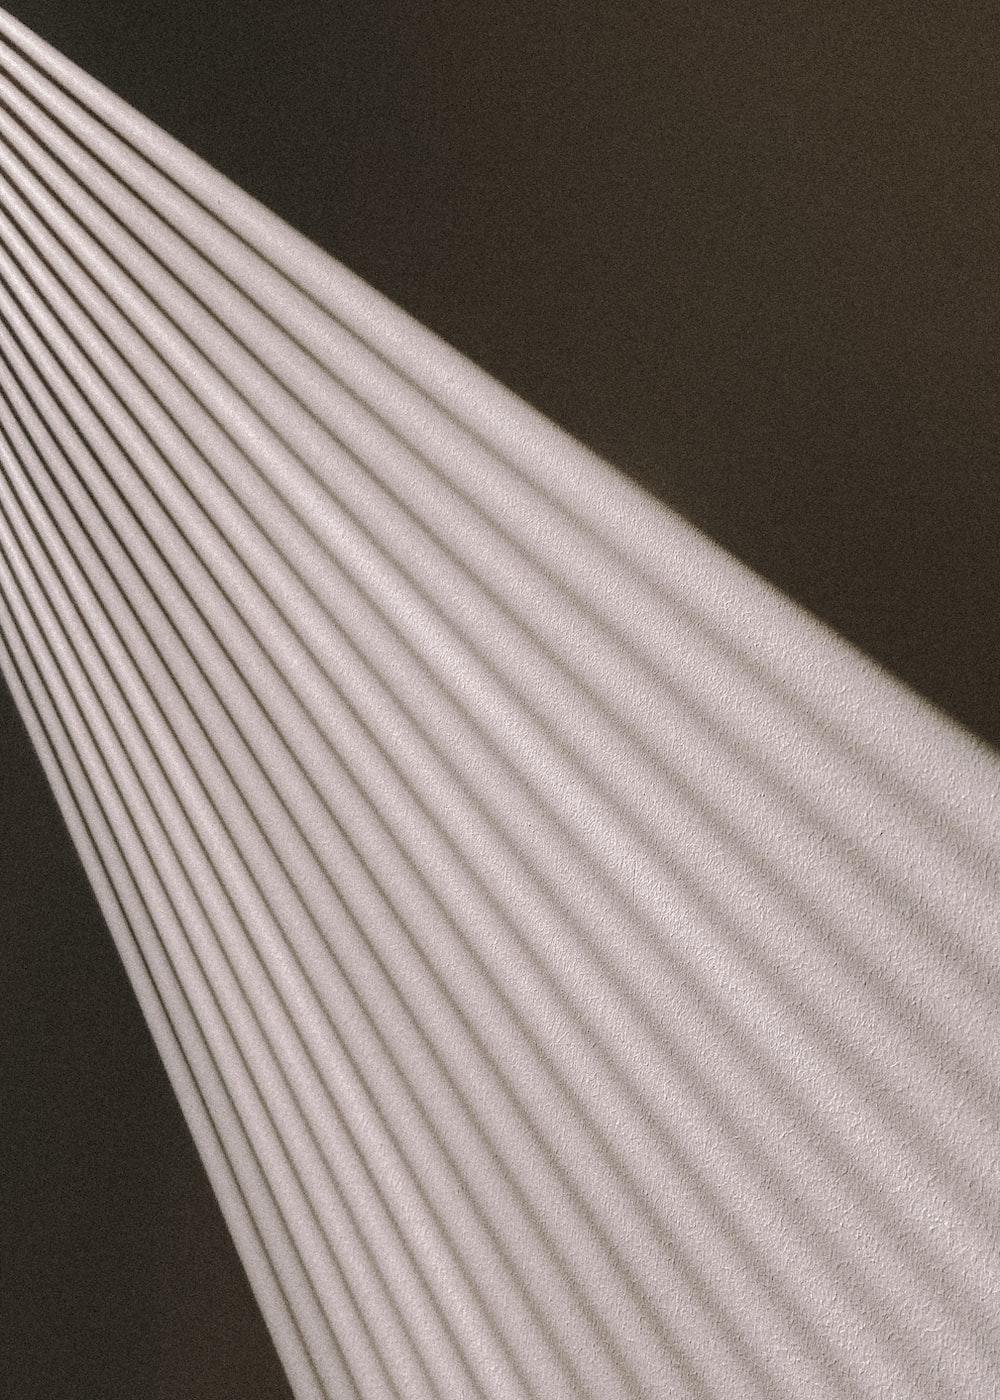 white and black striped textile